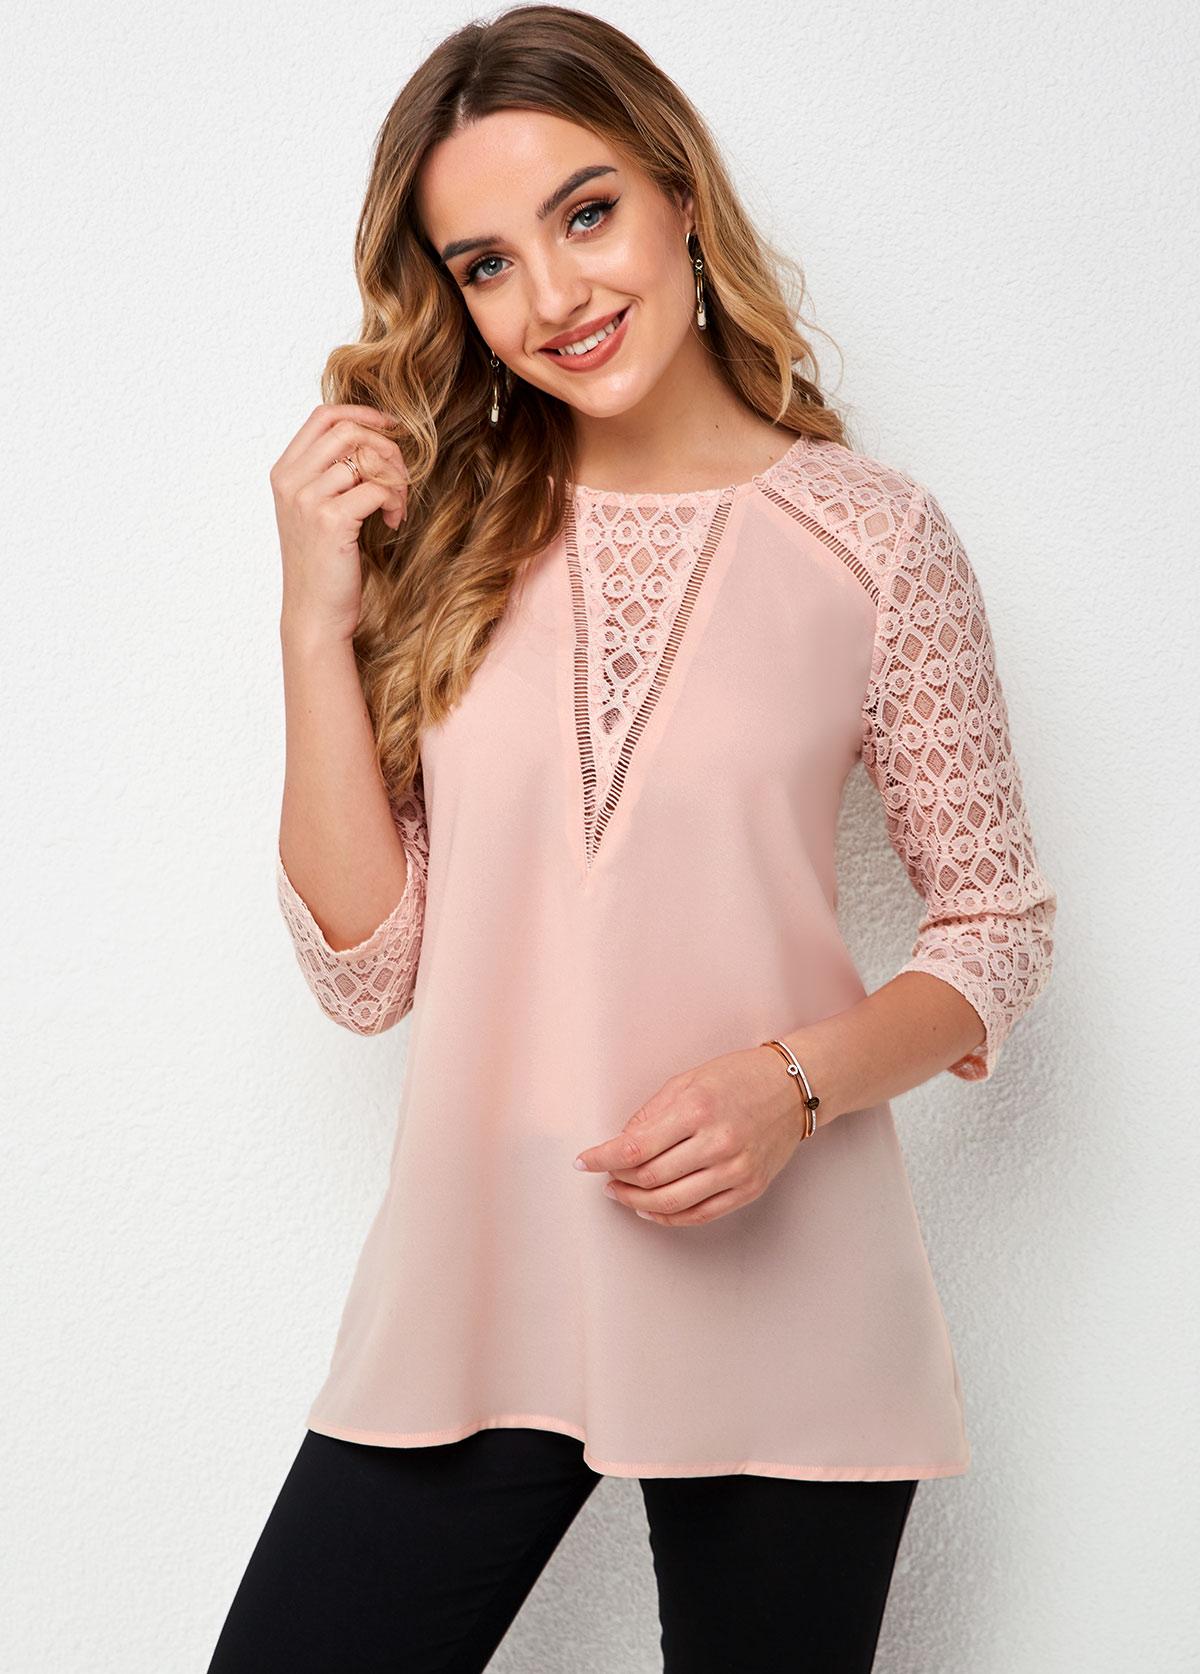 ROTITA Round Neck Lace Stitching 3/4 Sleeve T Shirt